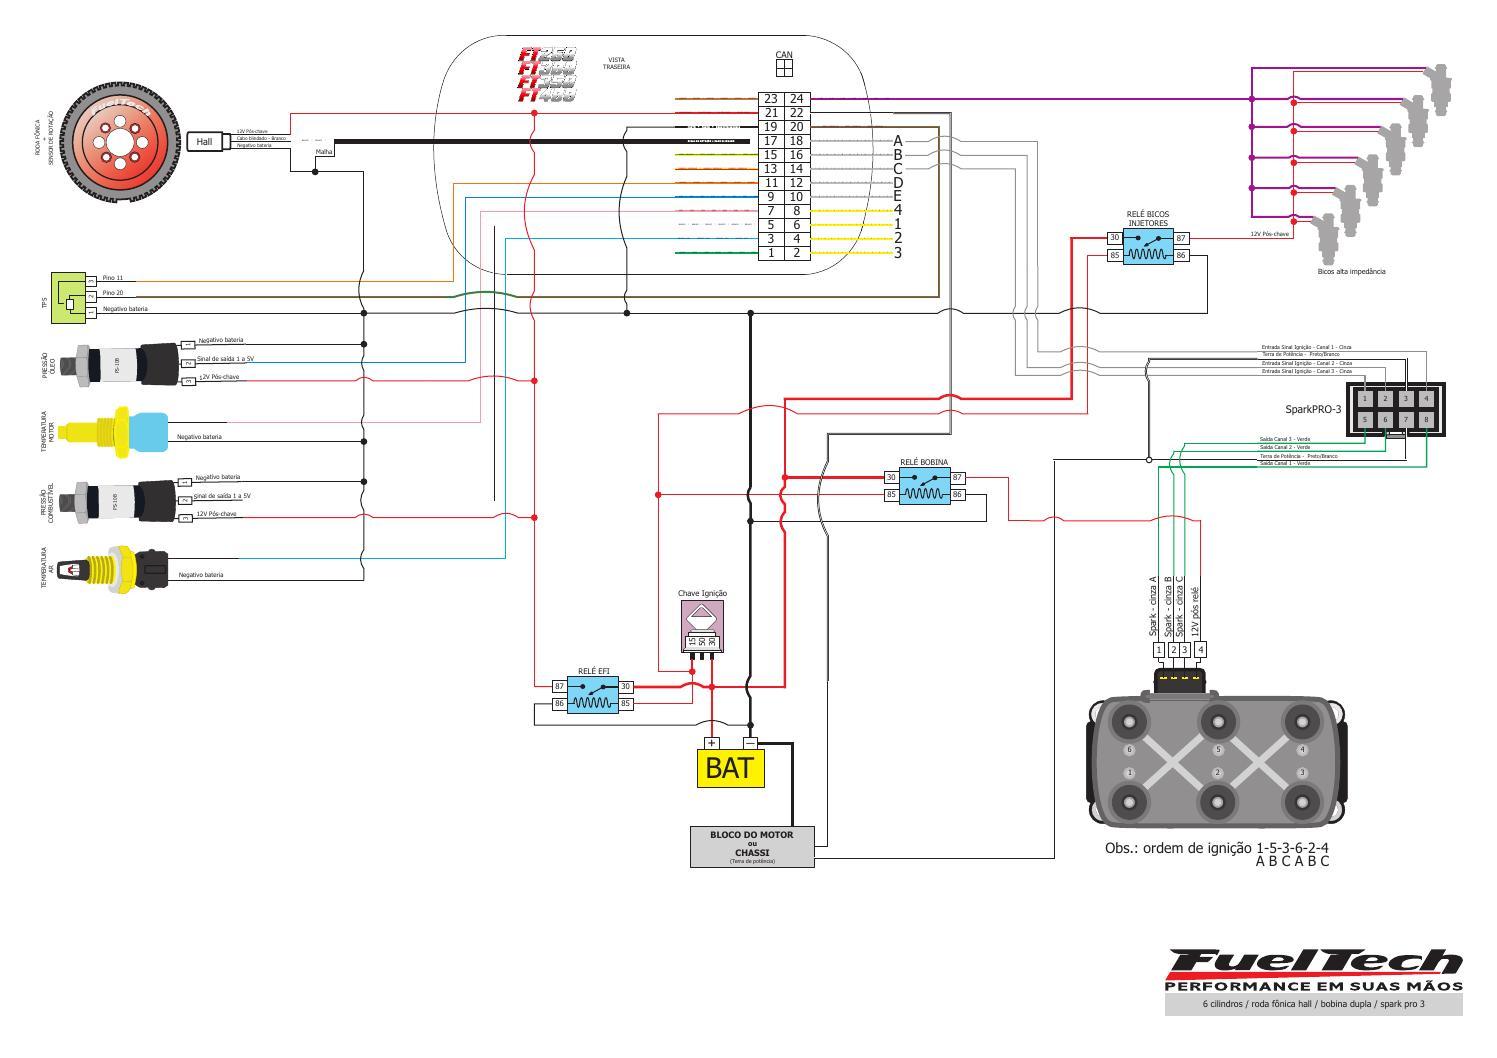 vista 20 wiring diagram  | issuu.com